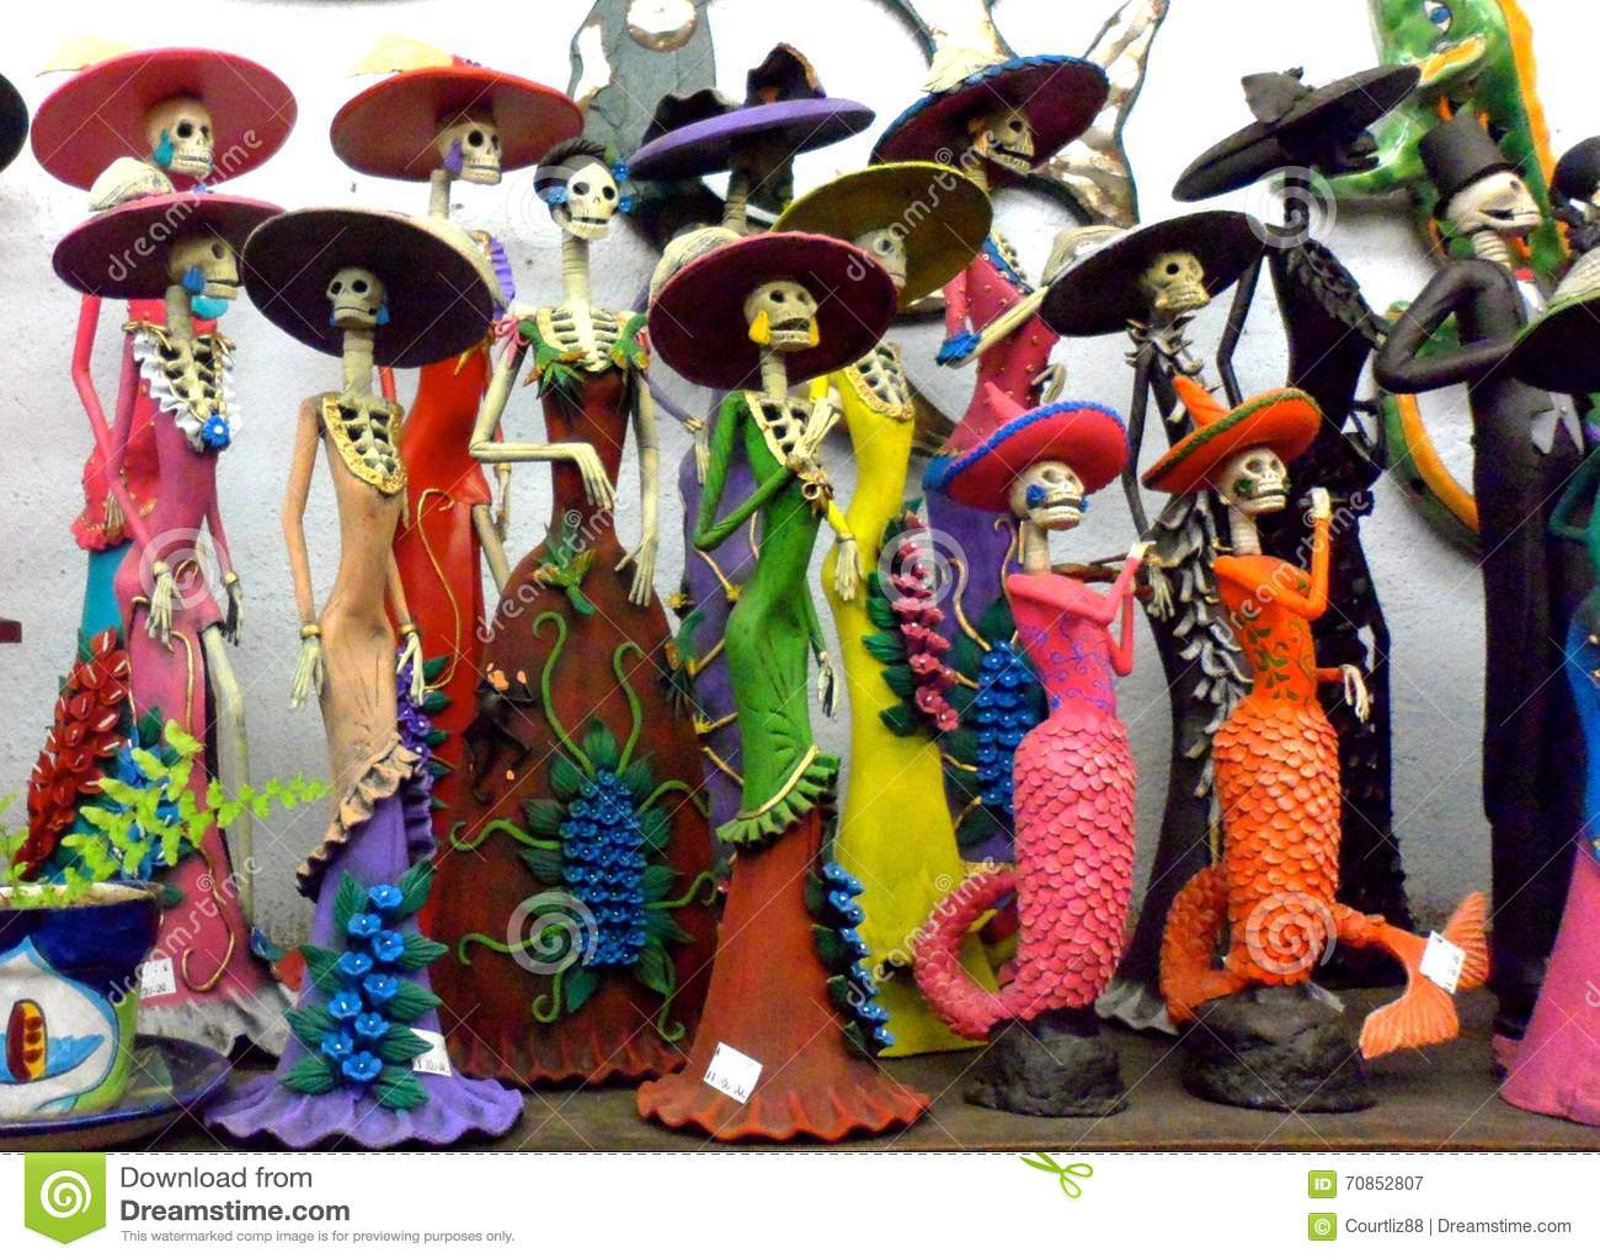 a report on la dia de los muertos the day of the dead a mexican holiday World mexico day of the dead dia de los muertos photos  what is day of the dead how to celebrate dia de los muertos without being offensive  día de los muertos isn't 'mexican halloween .